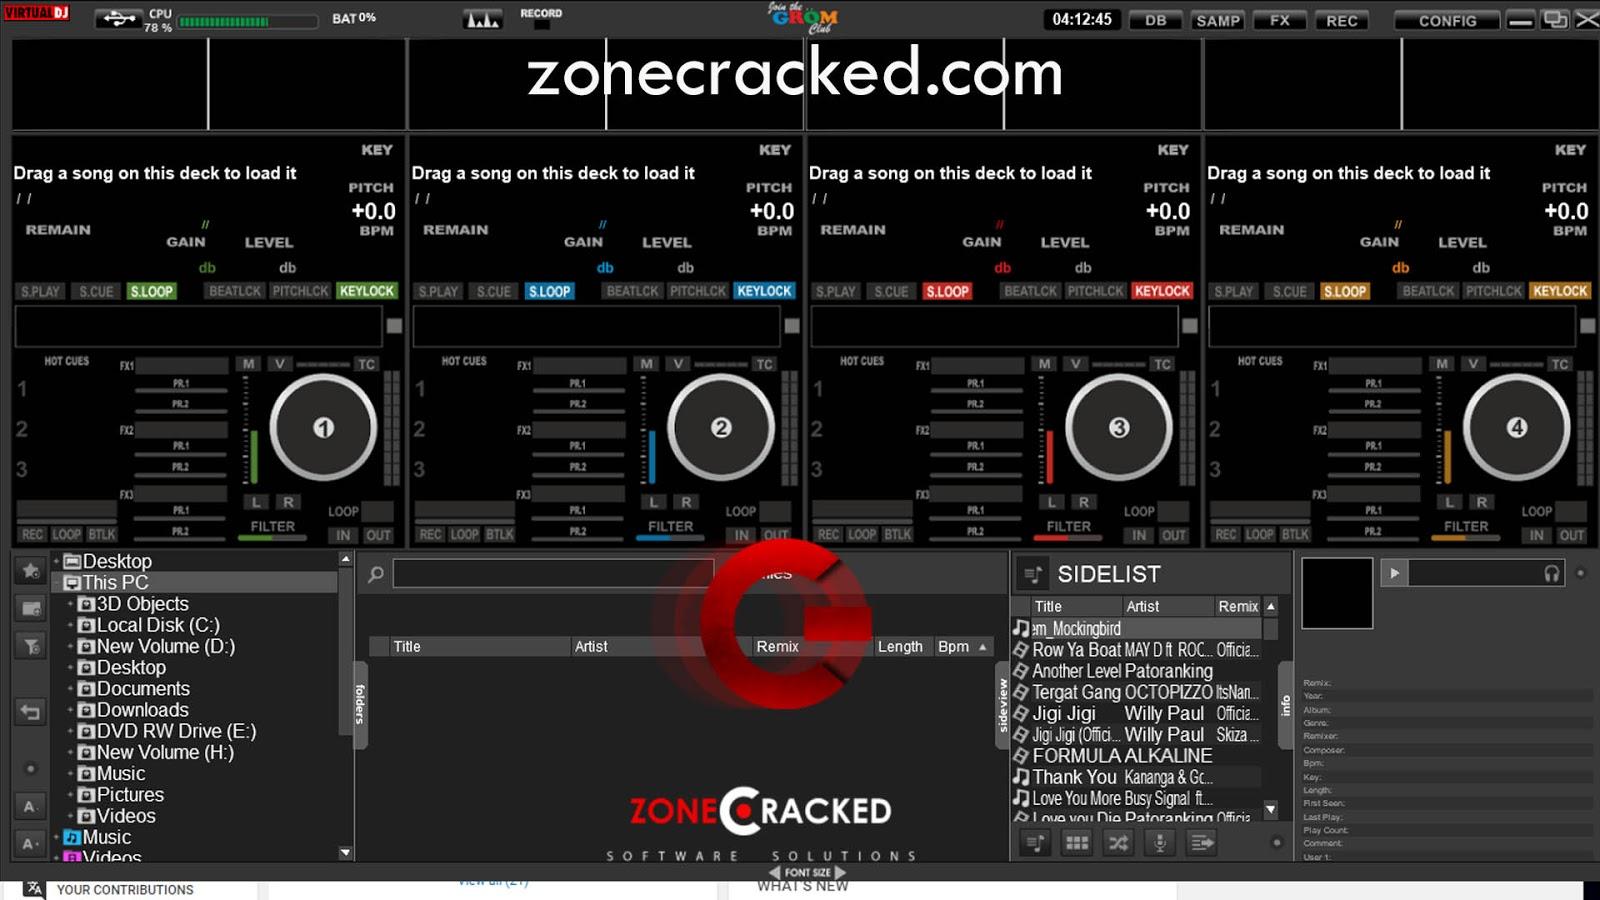 Grom_4_Decks Virtual Dj Skin   Zone Cracked - Virtual DJ